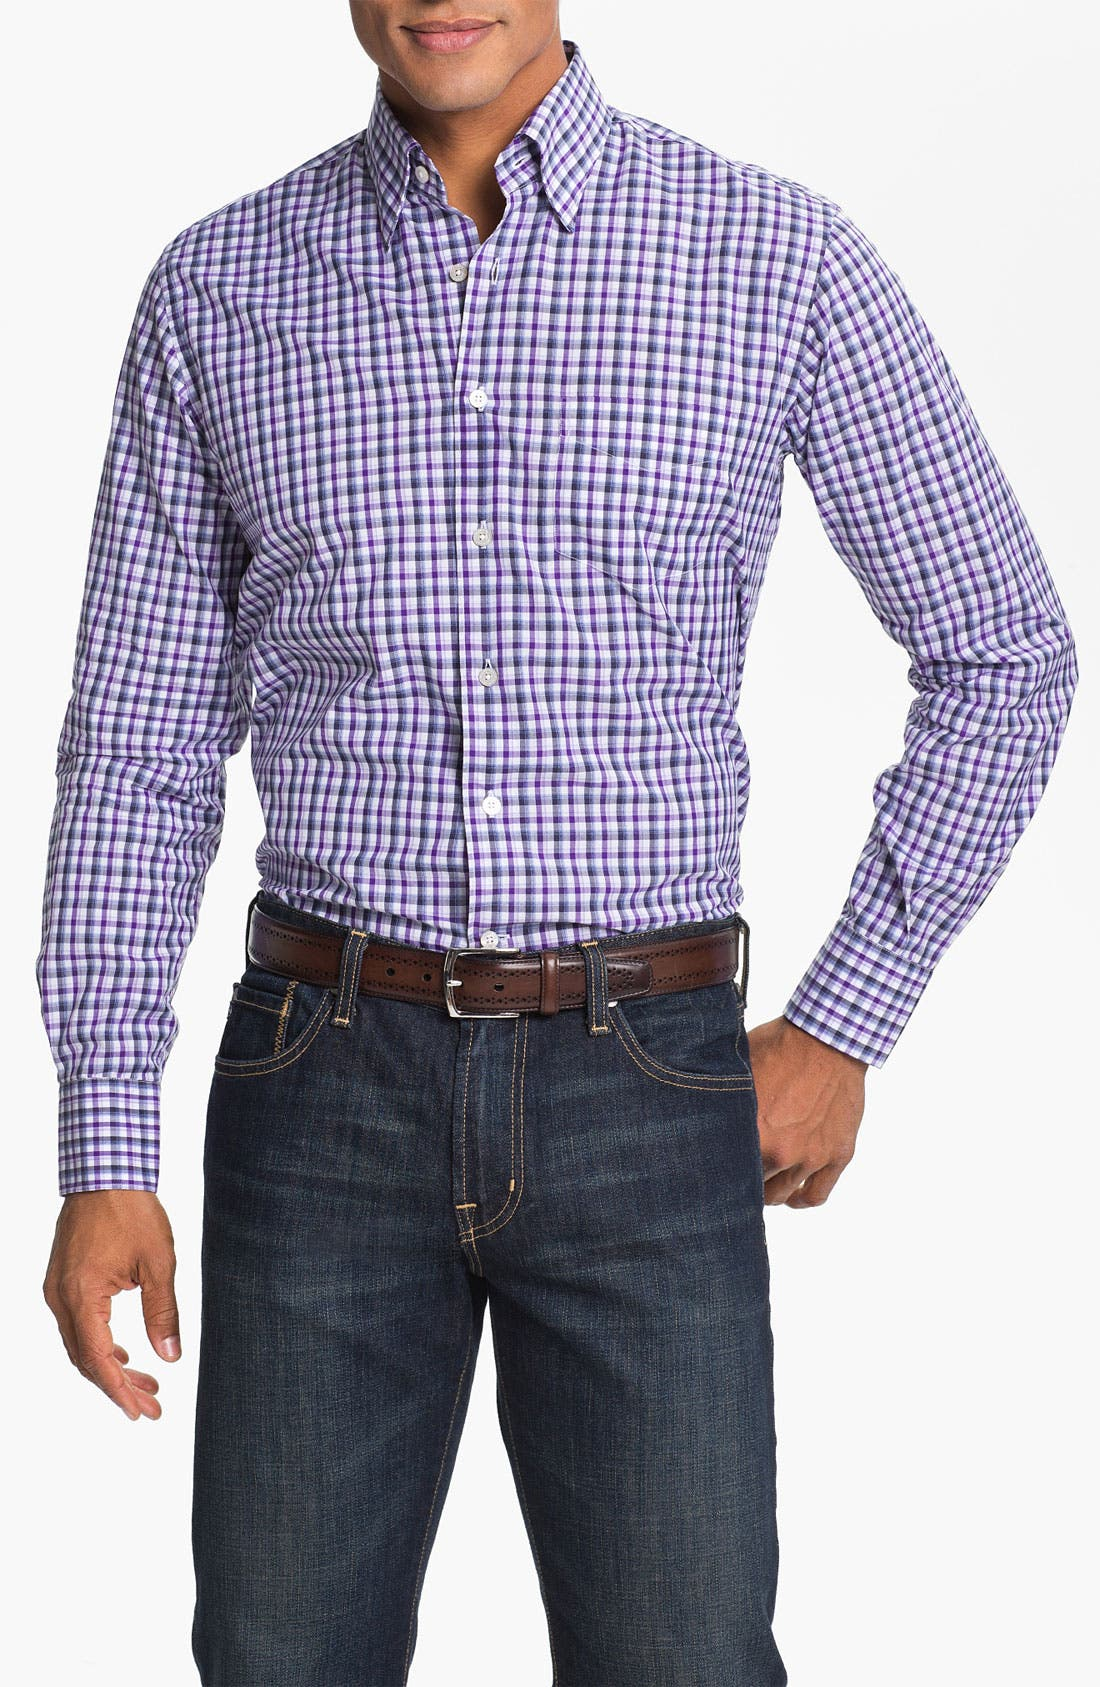 Alternate Image 1 Selected - Canali Regular Fit Sport Shirt